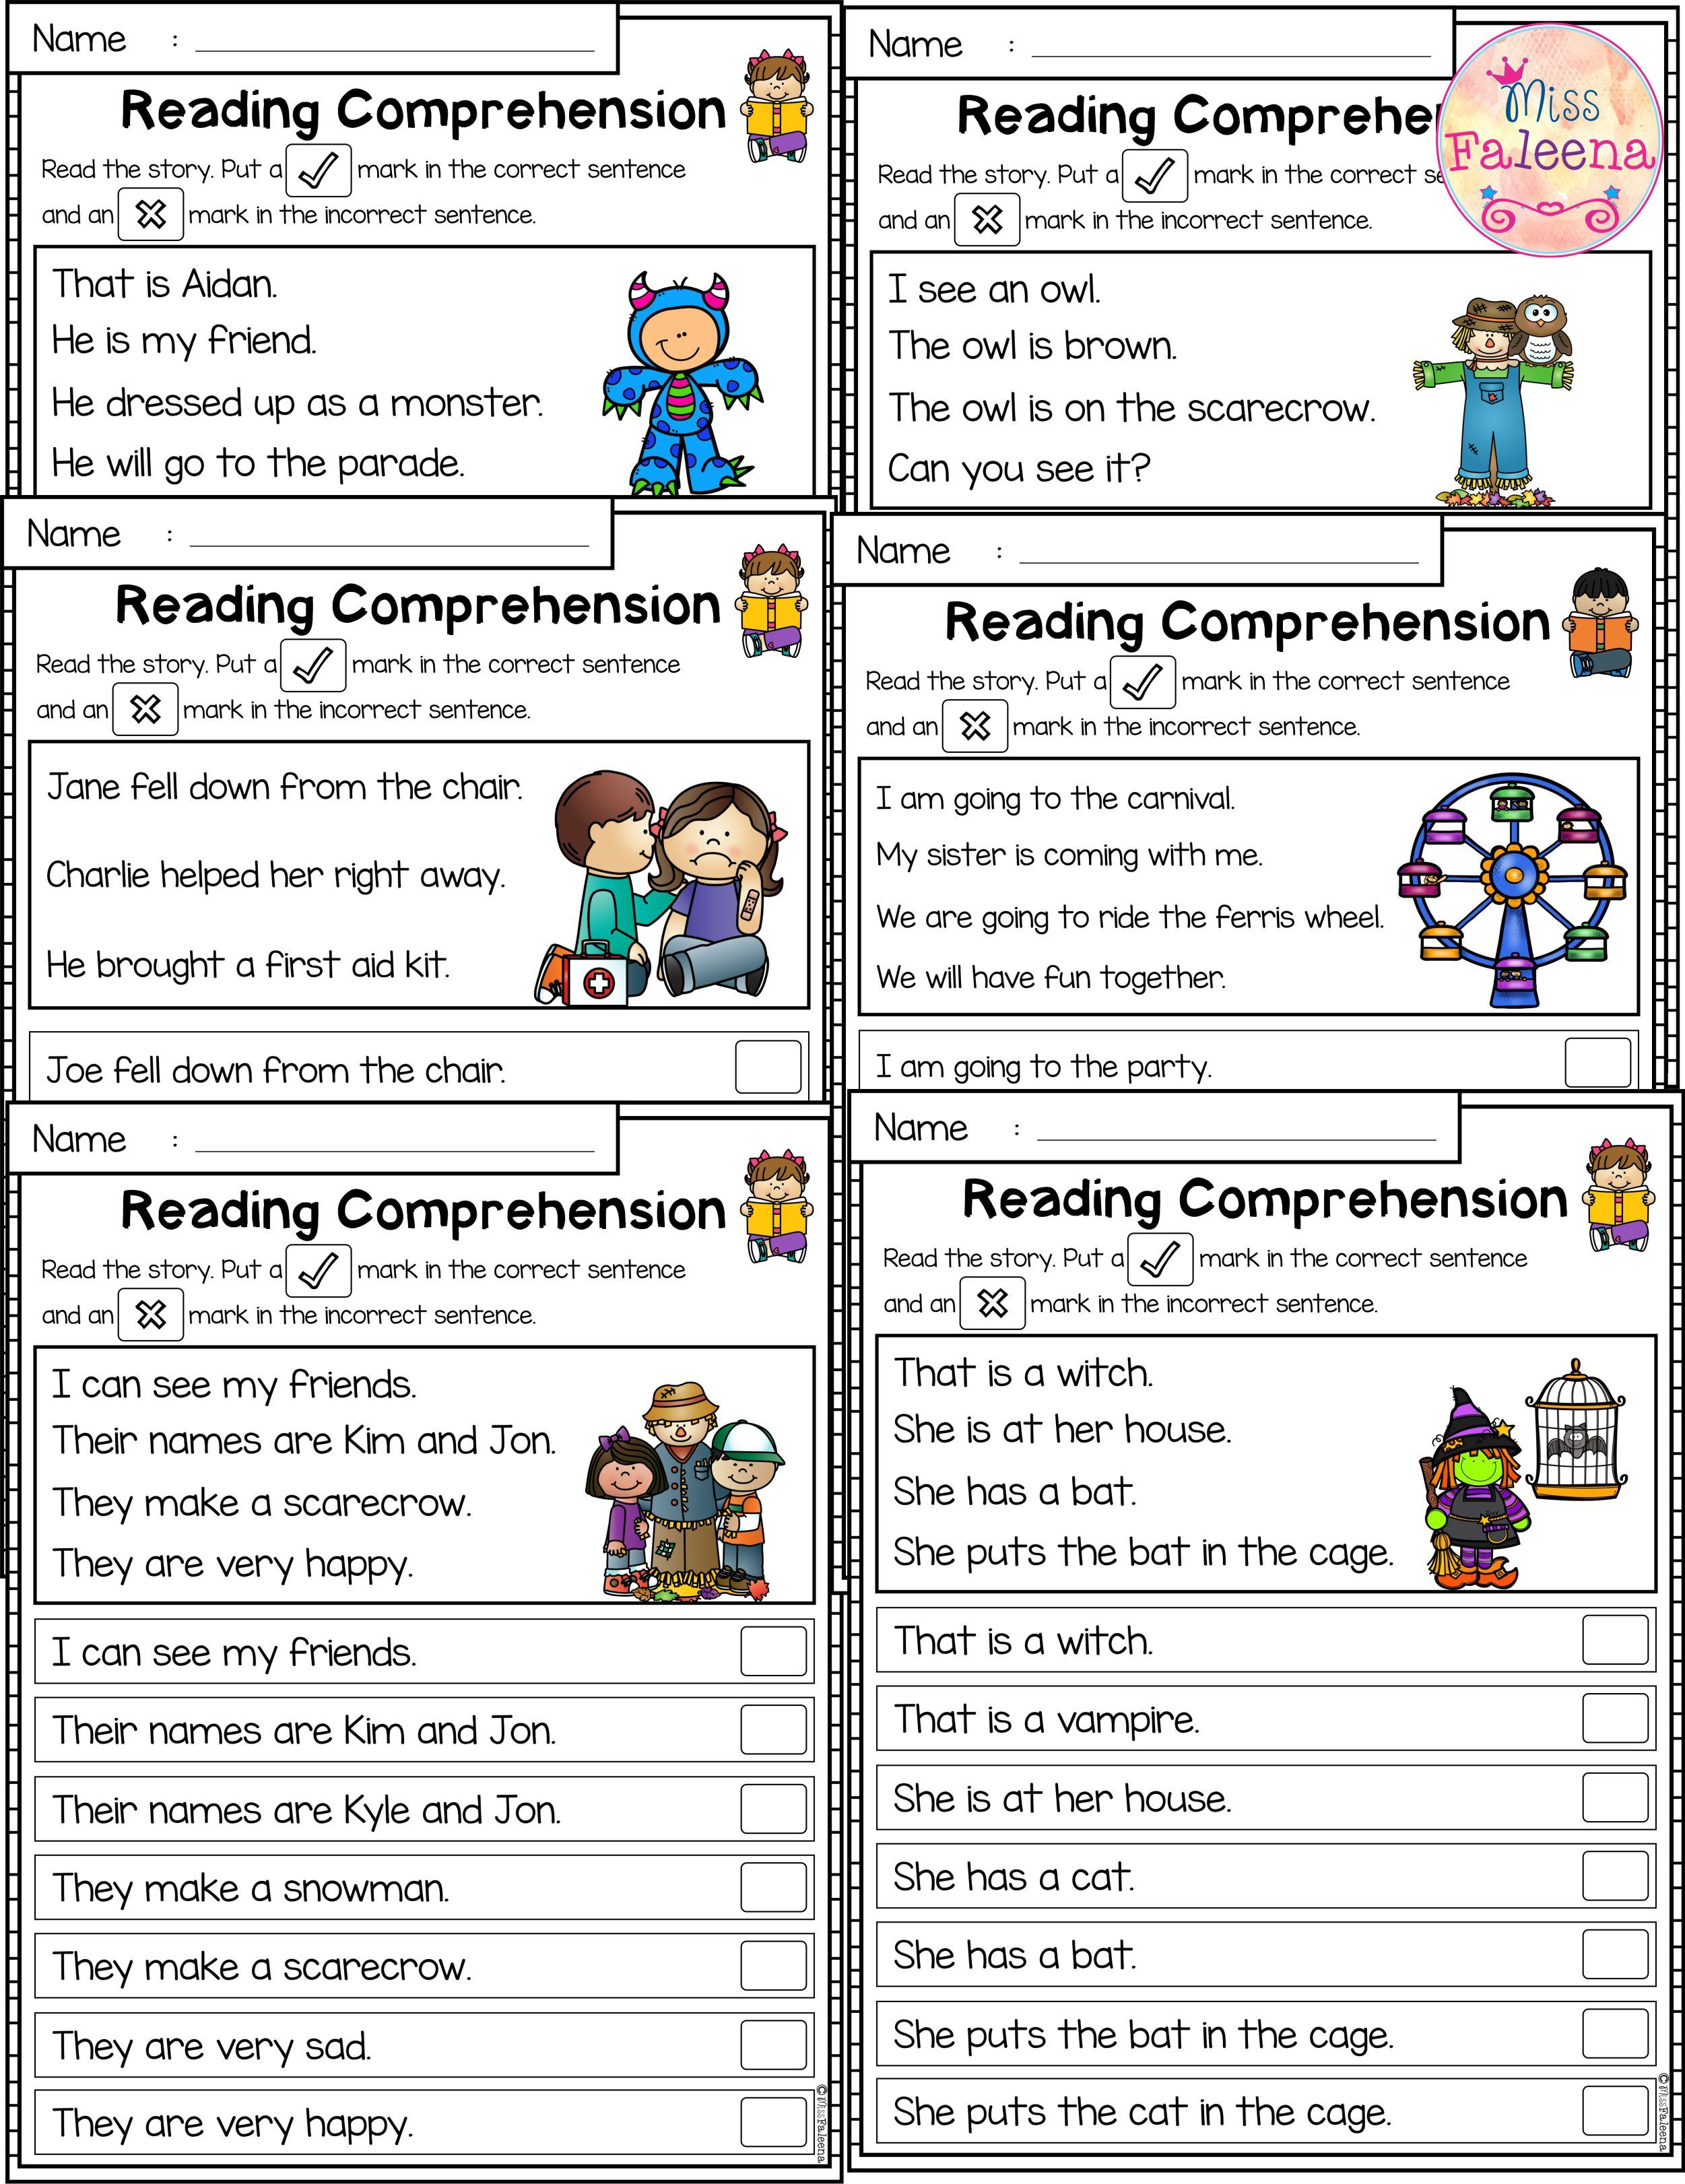 October Reading Comprehension Passages Reading Comprehension Reading Comprehension Passages Comprehension Passage [ 3243 x 2502 Pixel ]